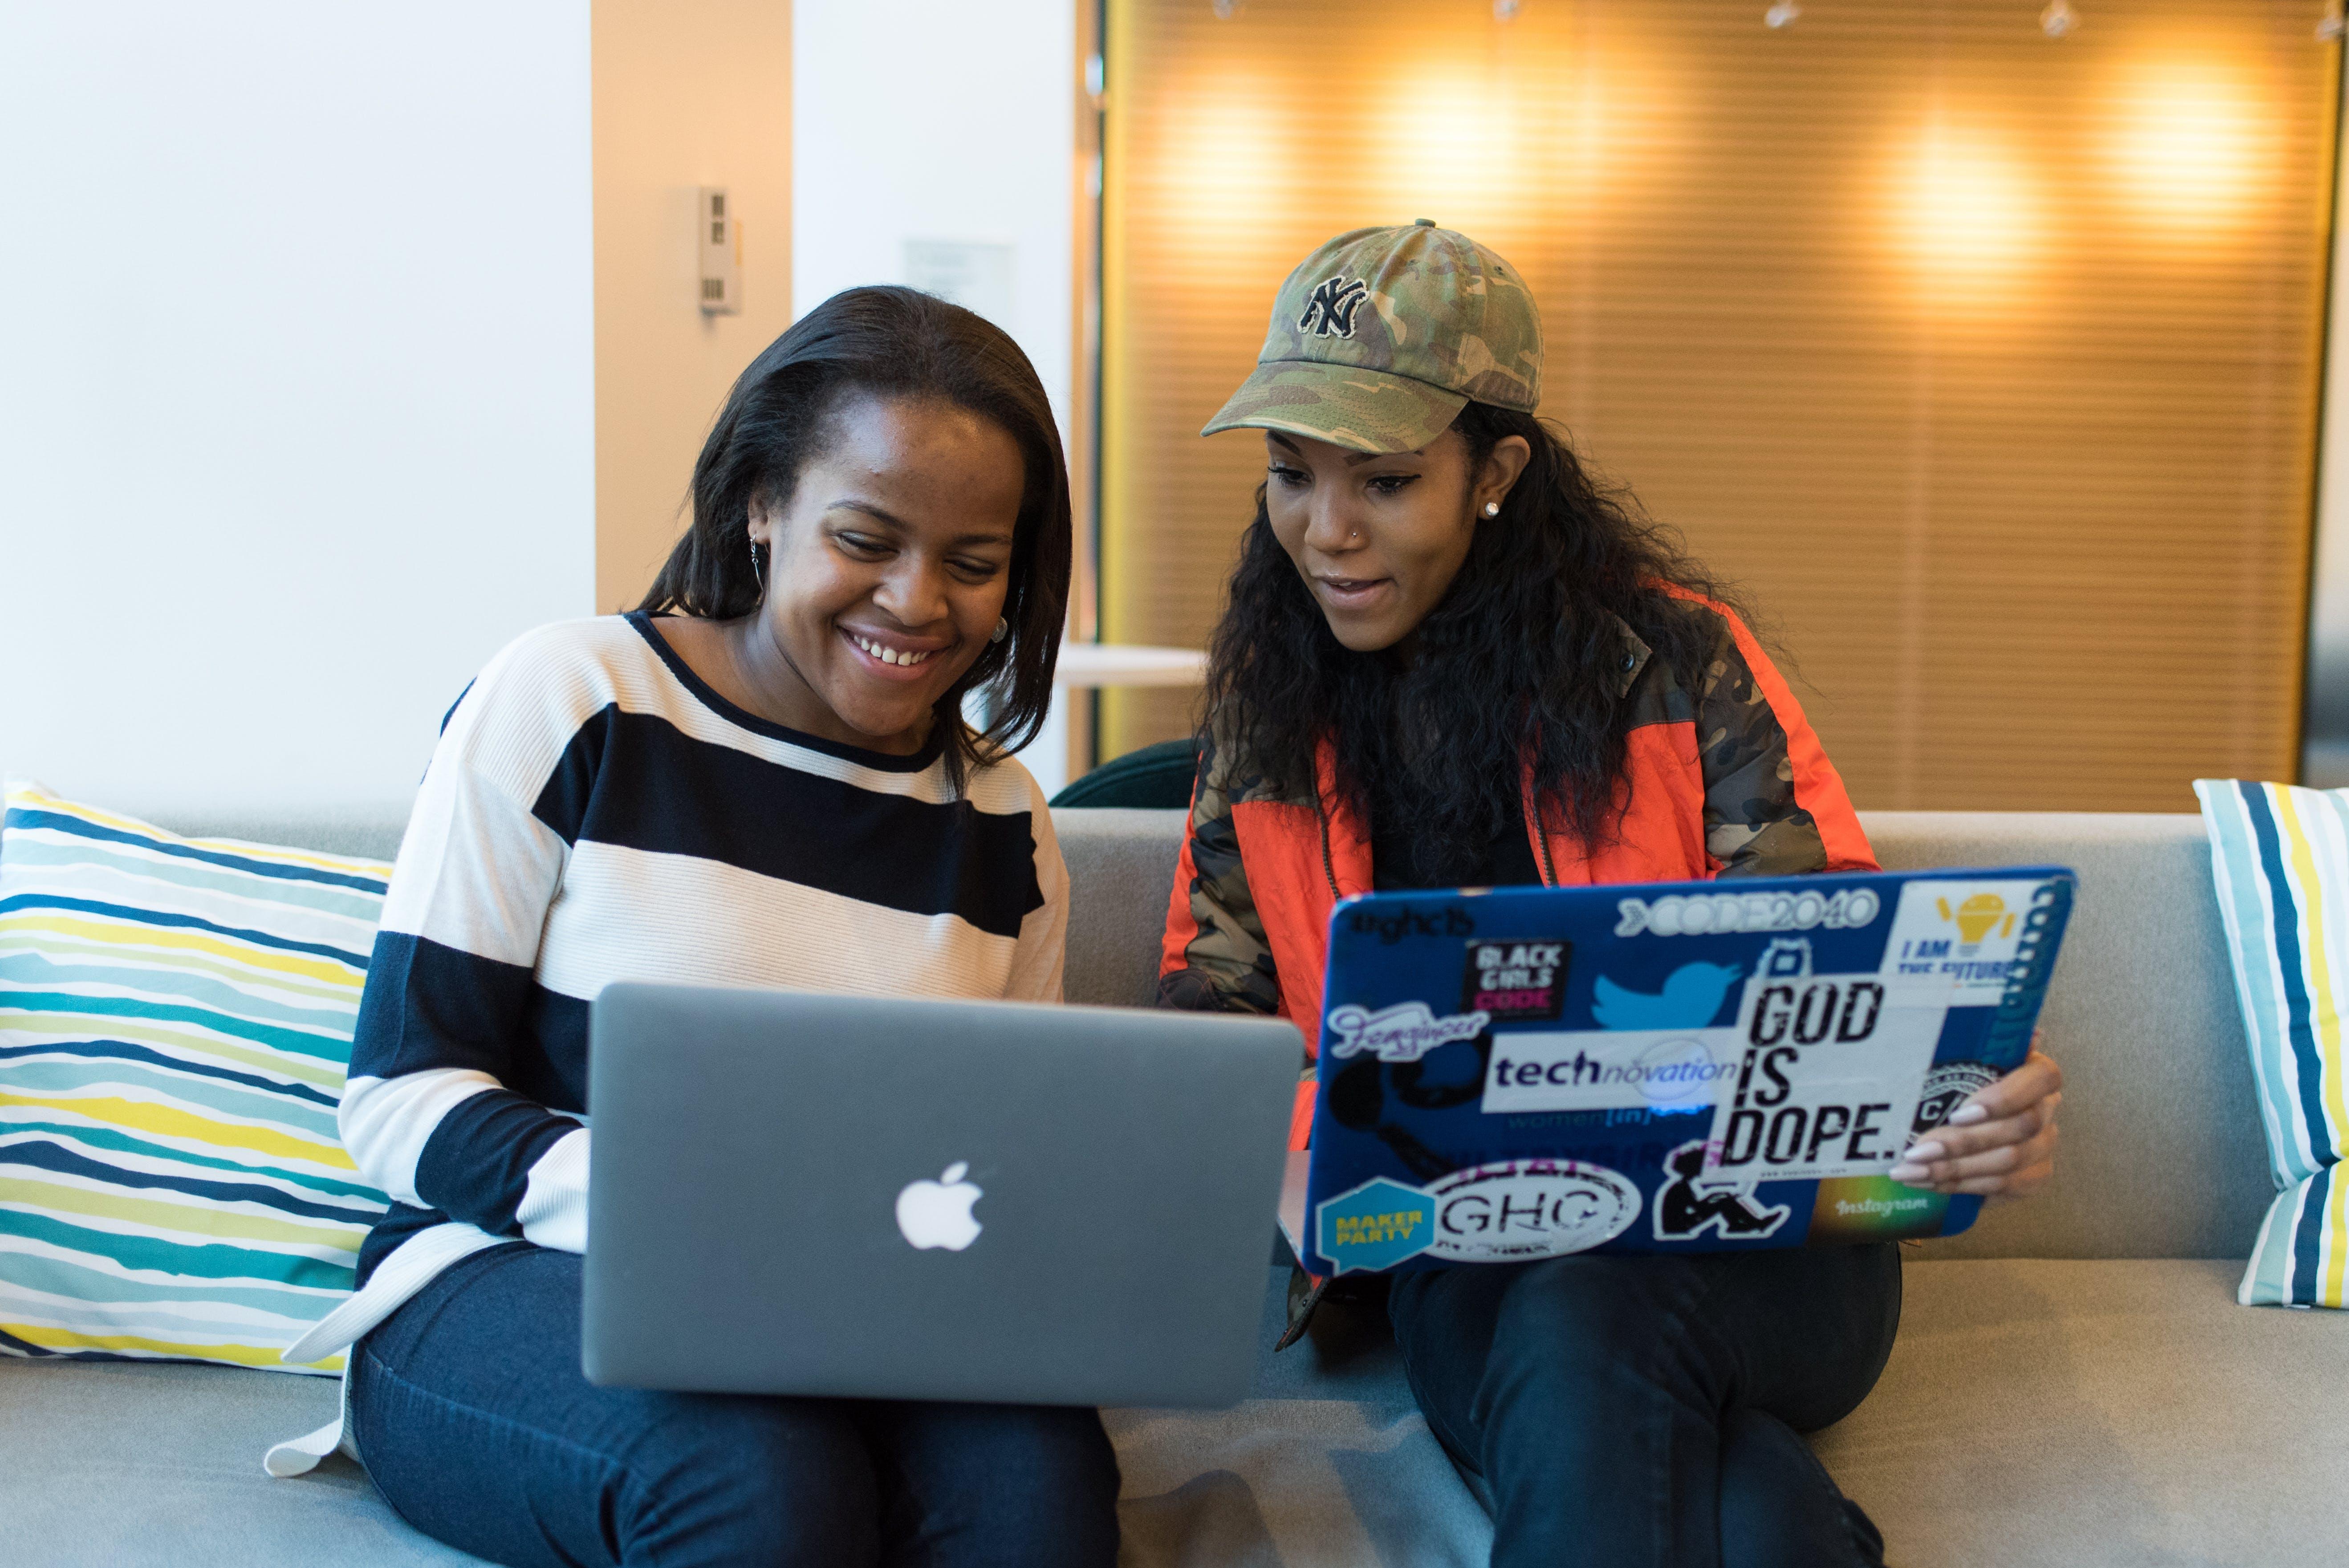 Two Women Holding Laptop